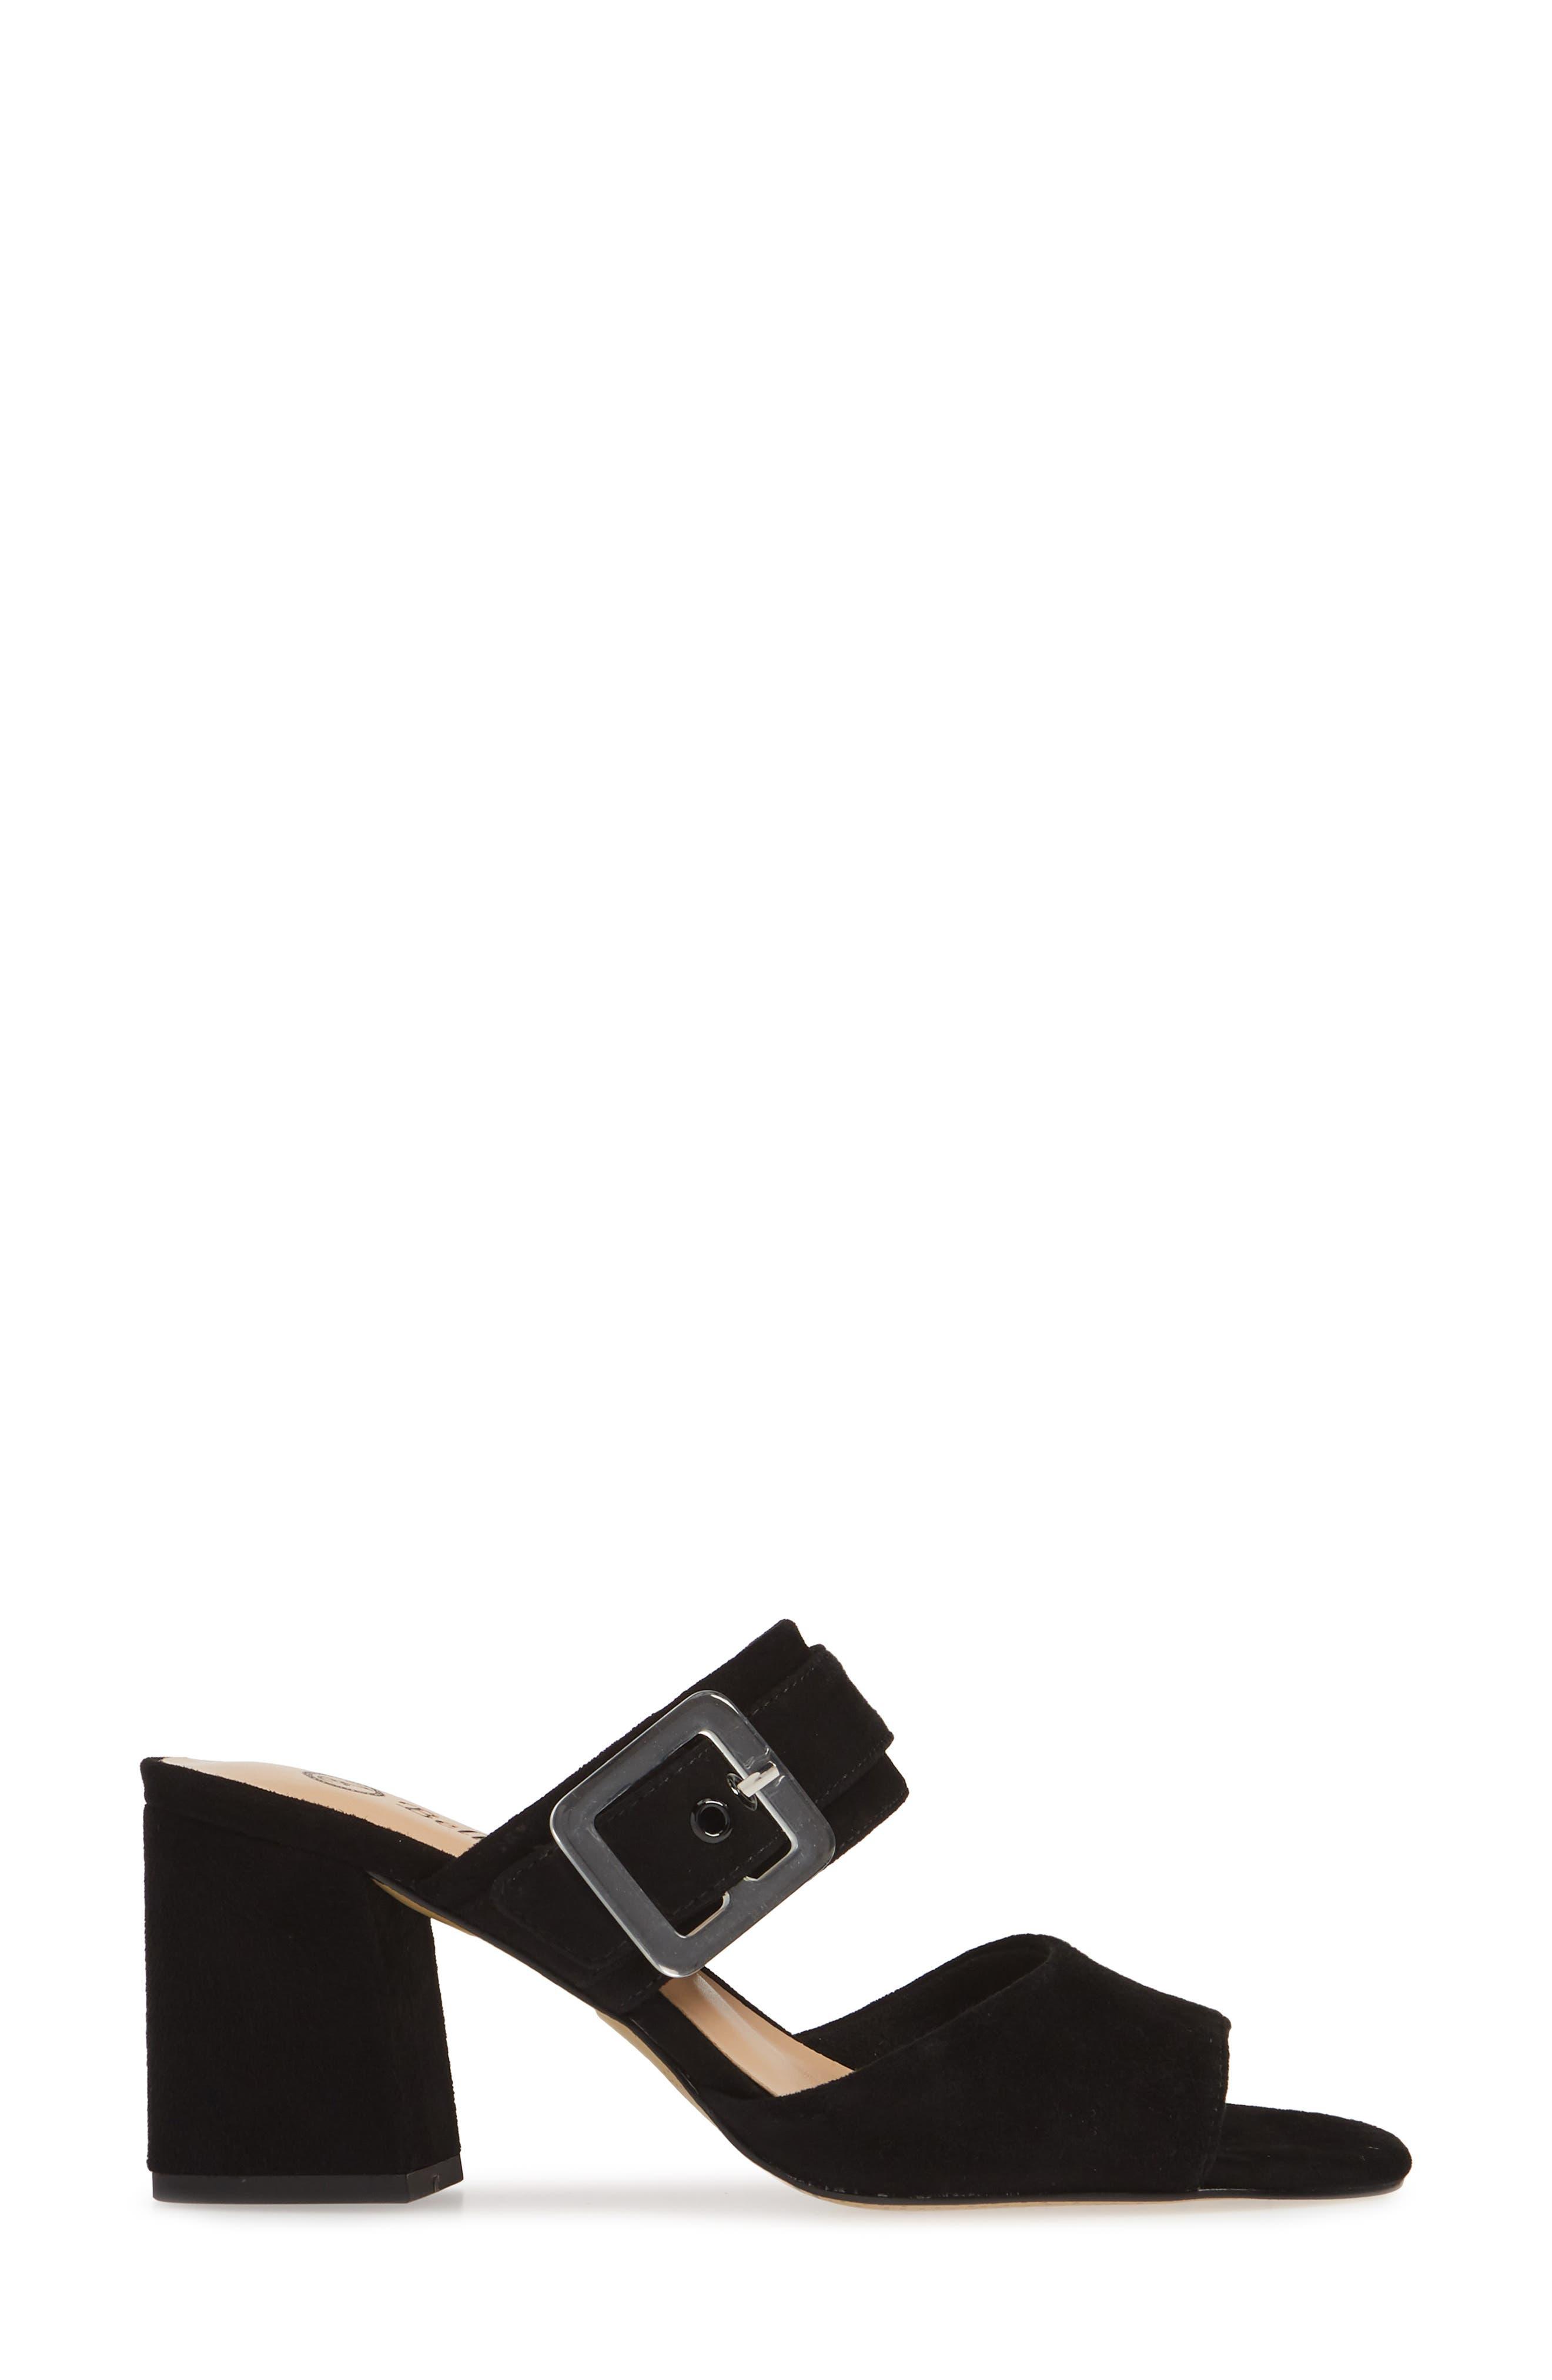 Tory Buckle Slide Sandal,                             Alternate thumbnail 3, color,                             BLACK SUEDE